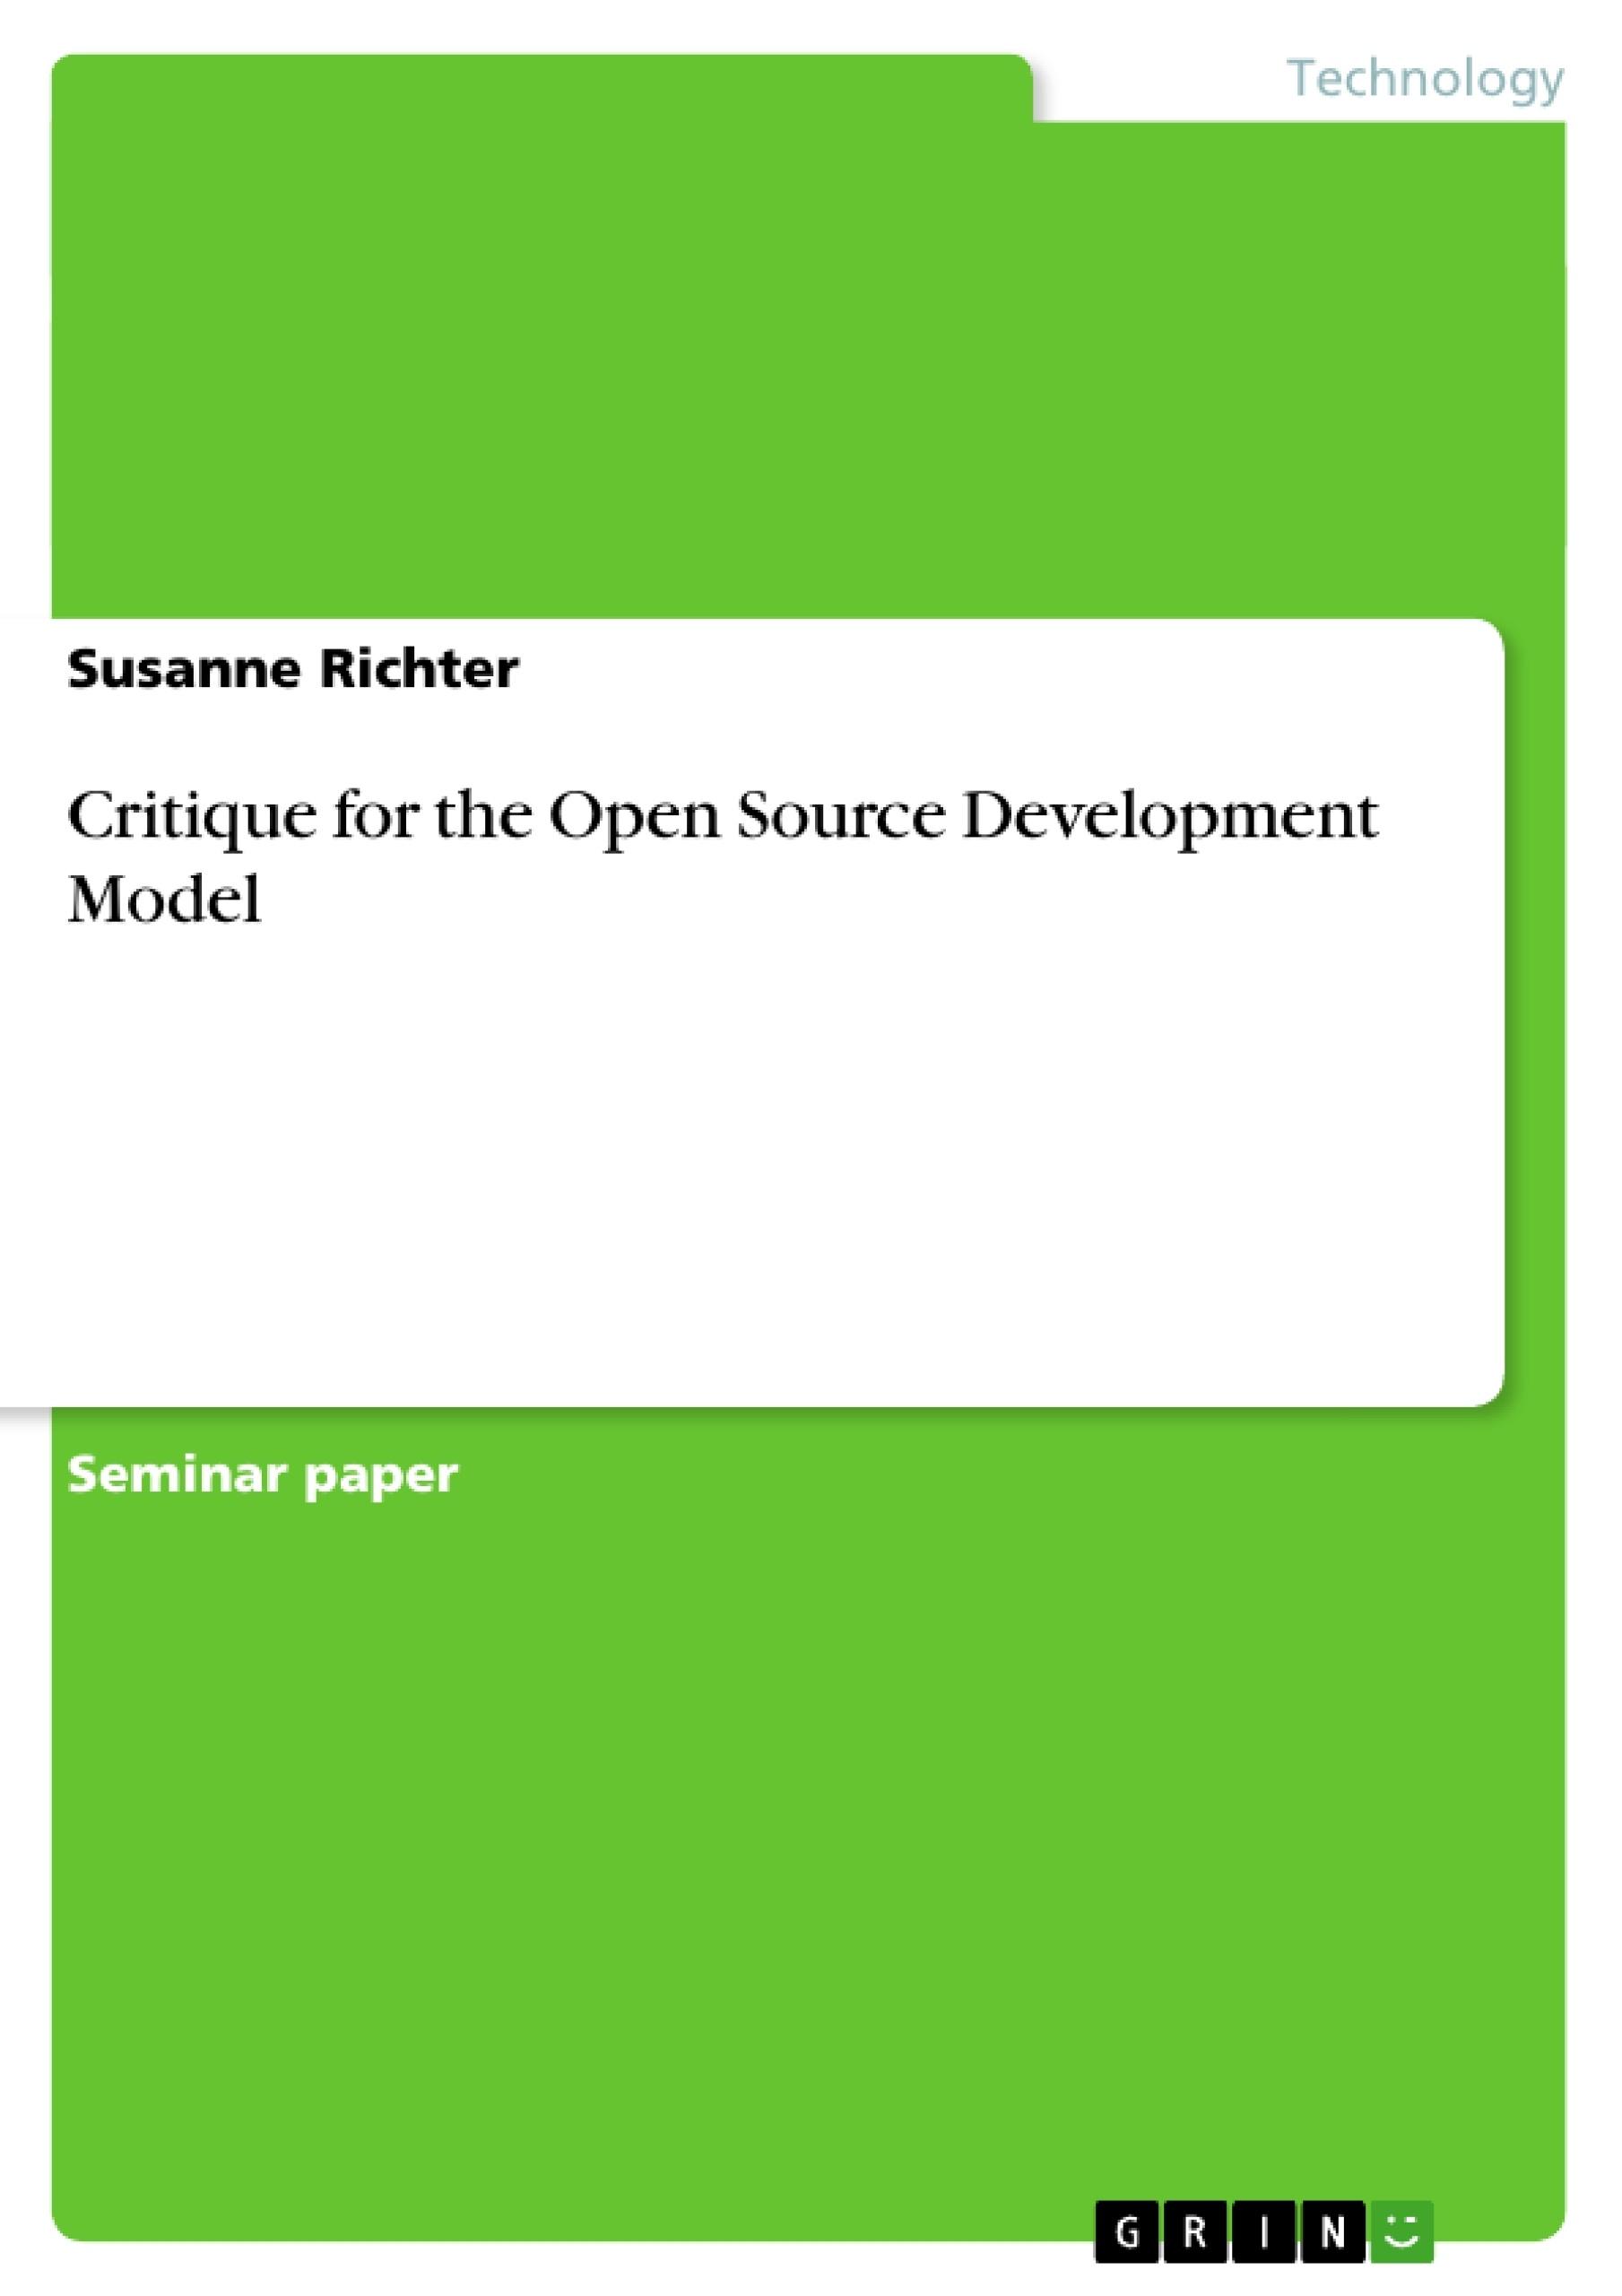 Title: Critique for the Open Source Development Model